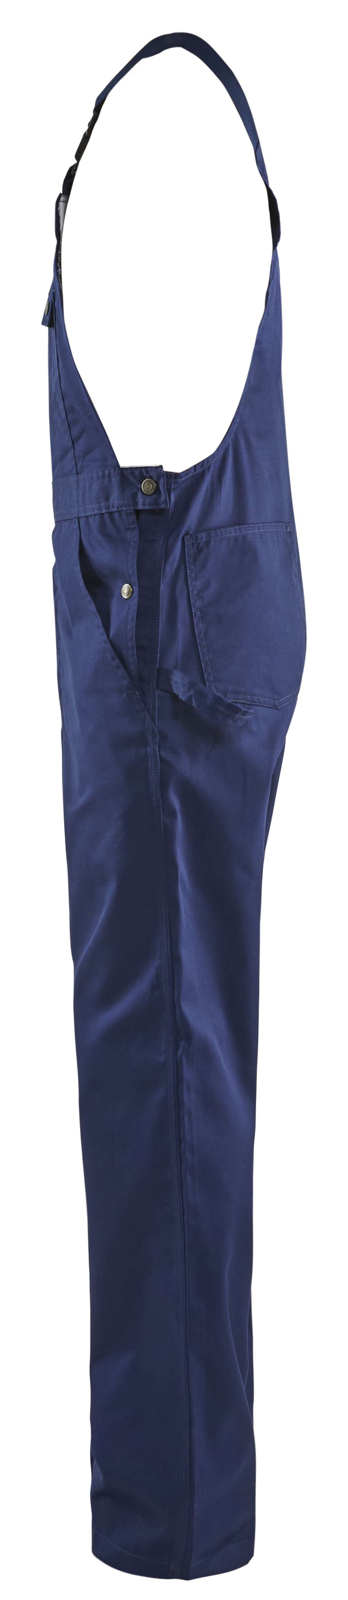 Blaklader Amerikaanse overalls 26101800 marineblauw(8900)